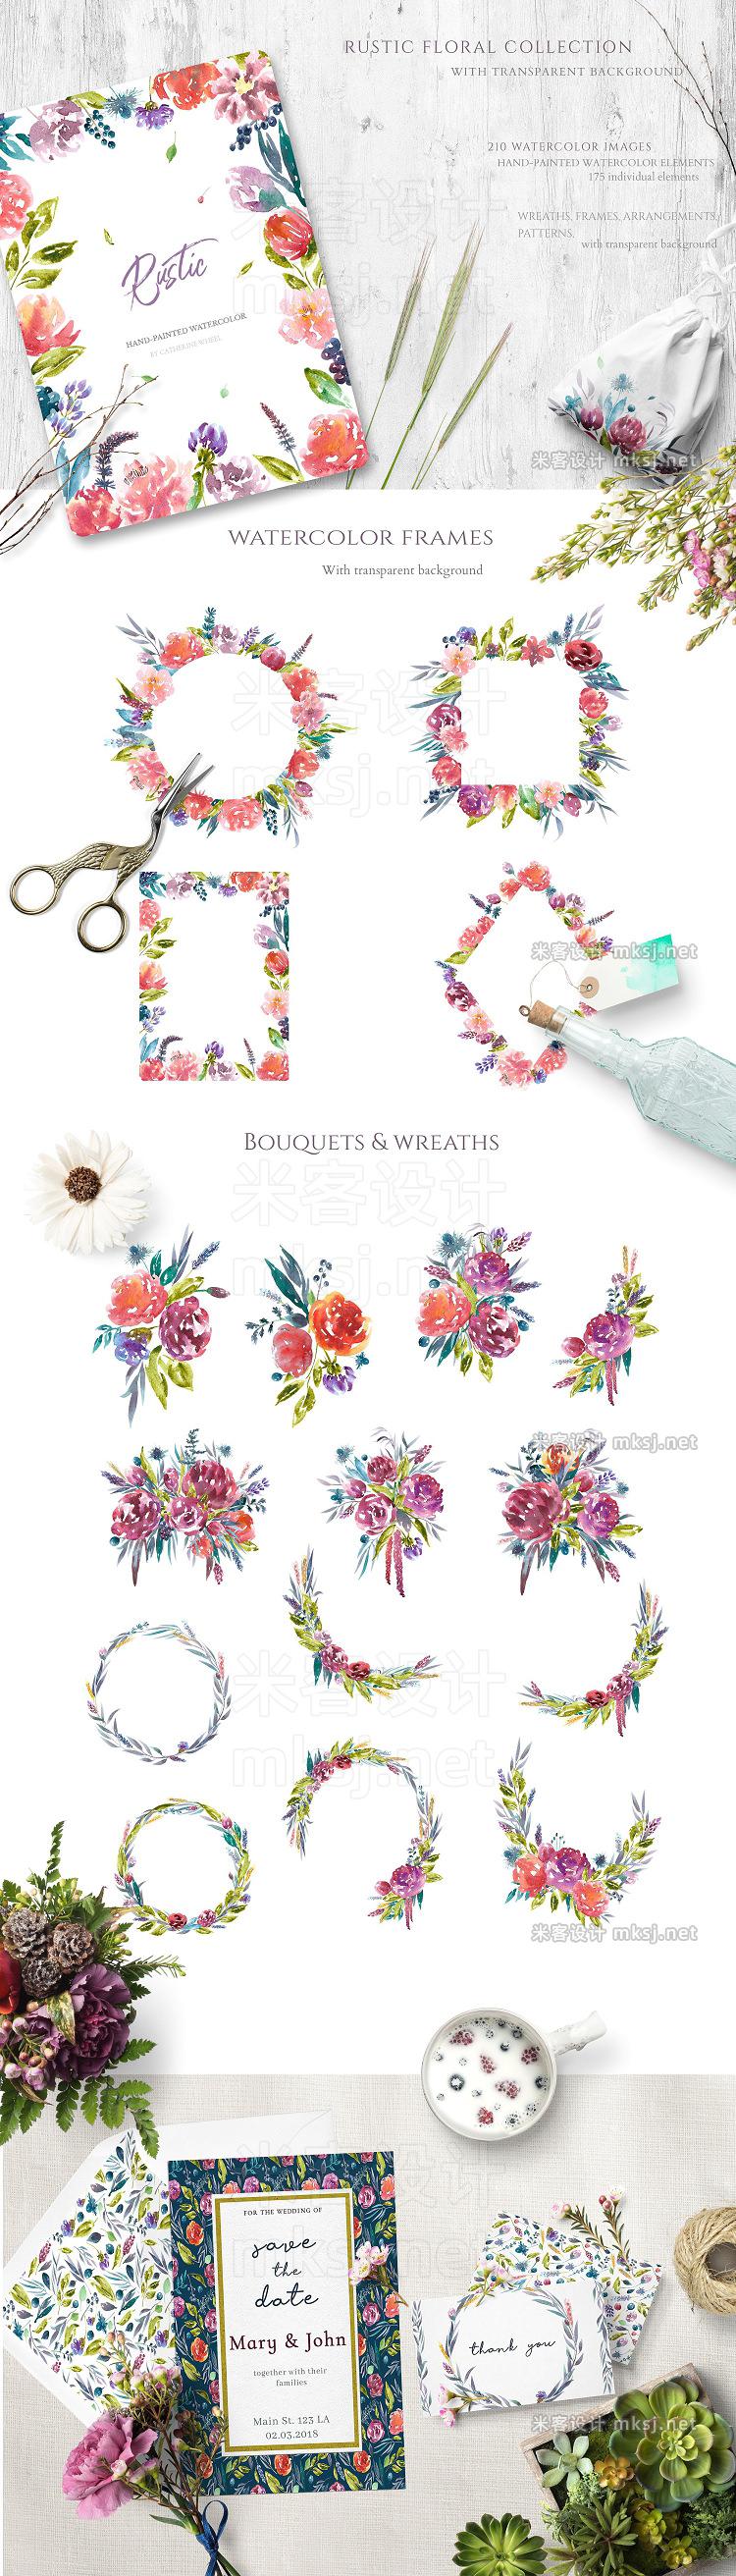 png素材 Rustic Watercolor Floral Set